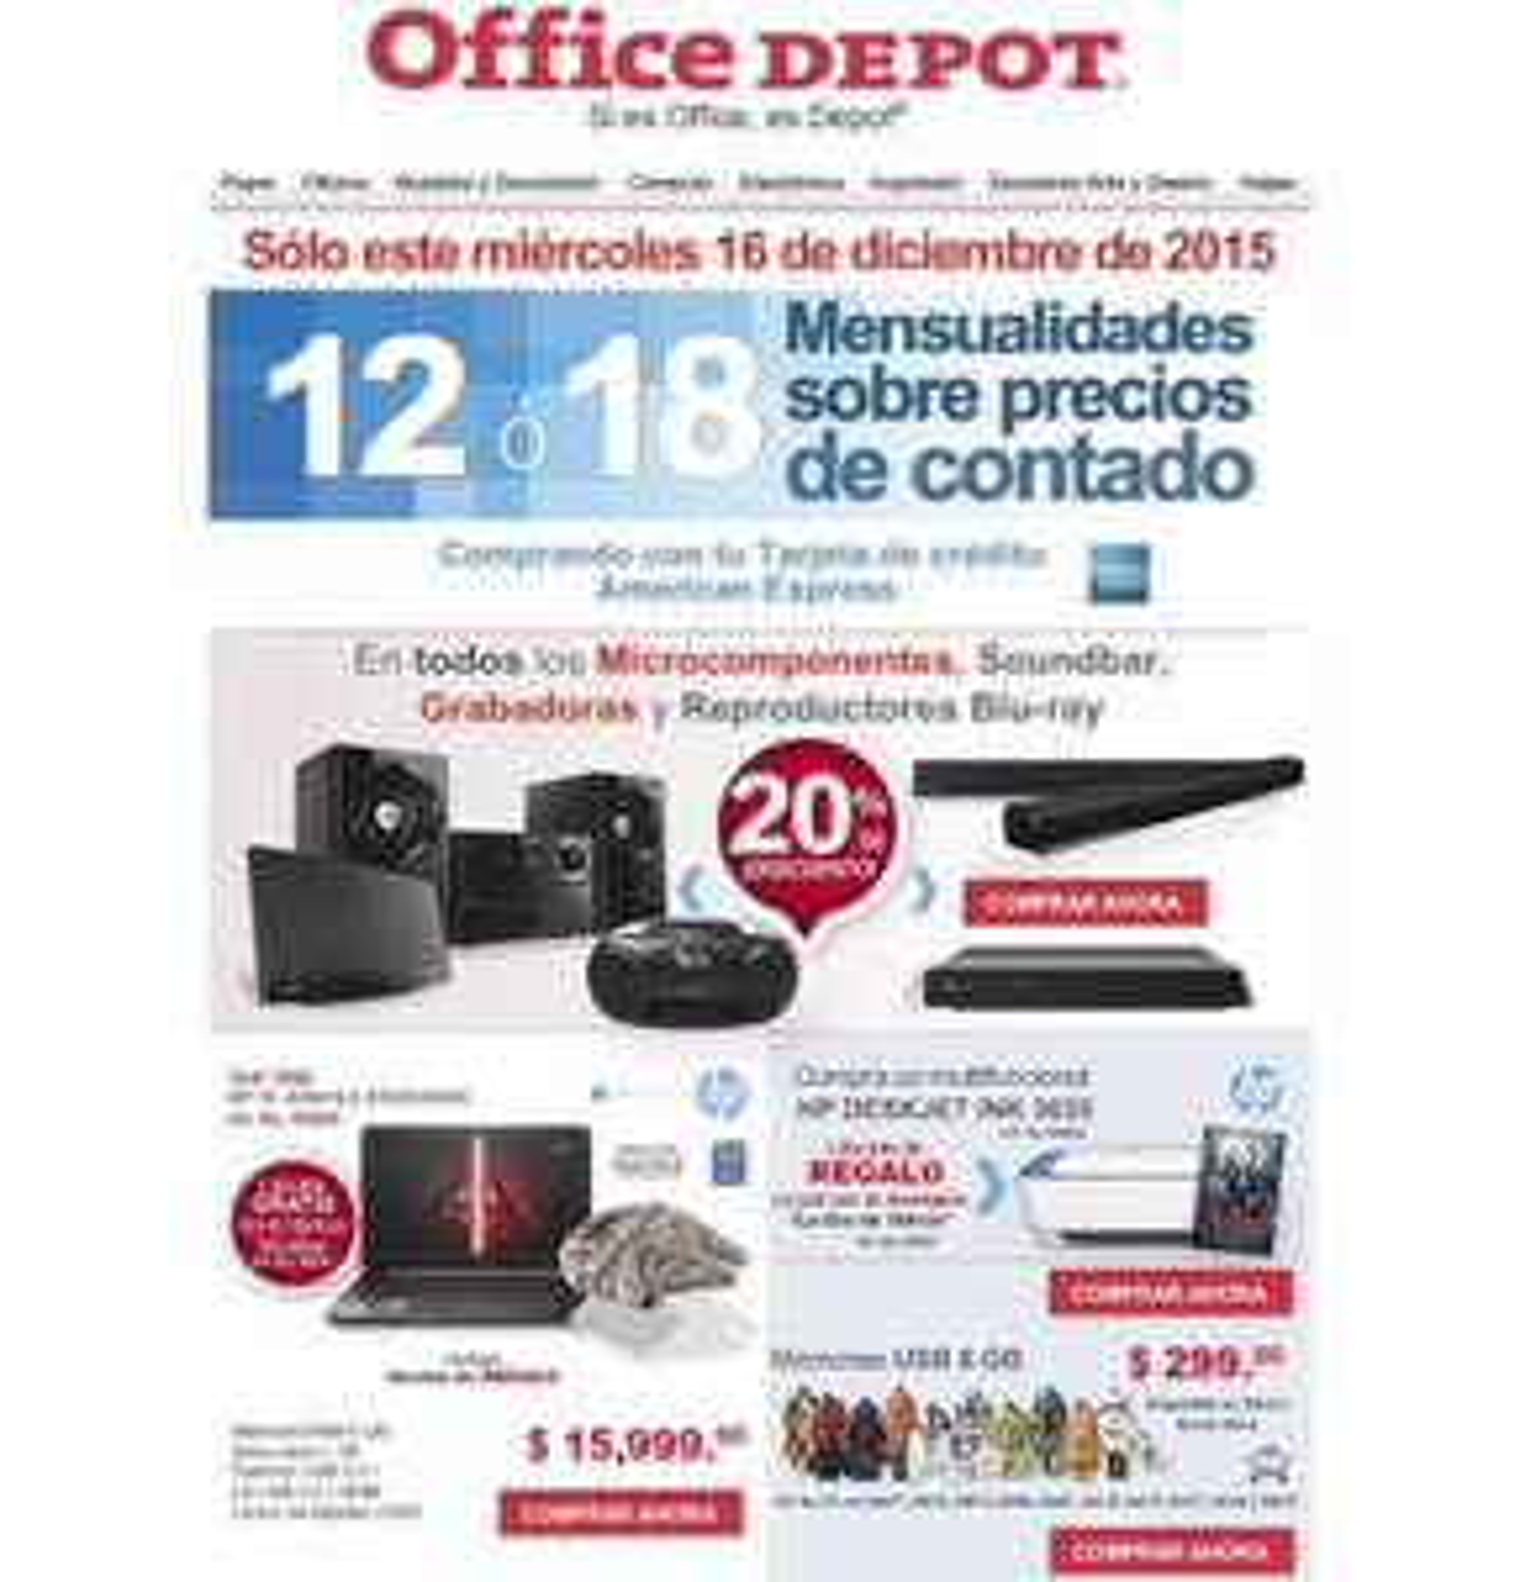 Office Depot: 12 ó 18 MSI con AMEX